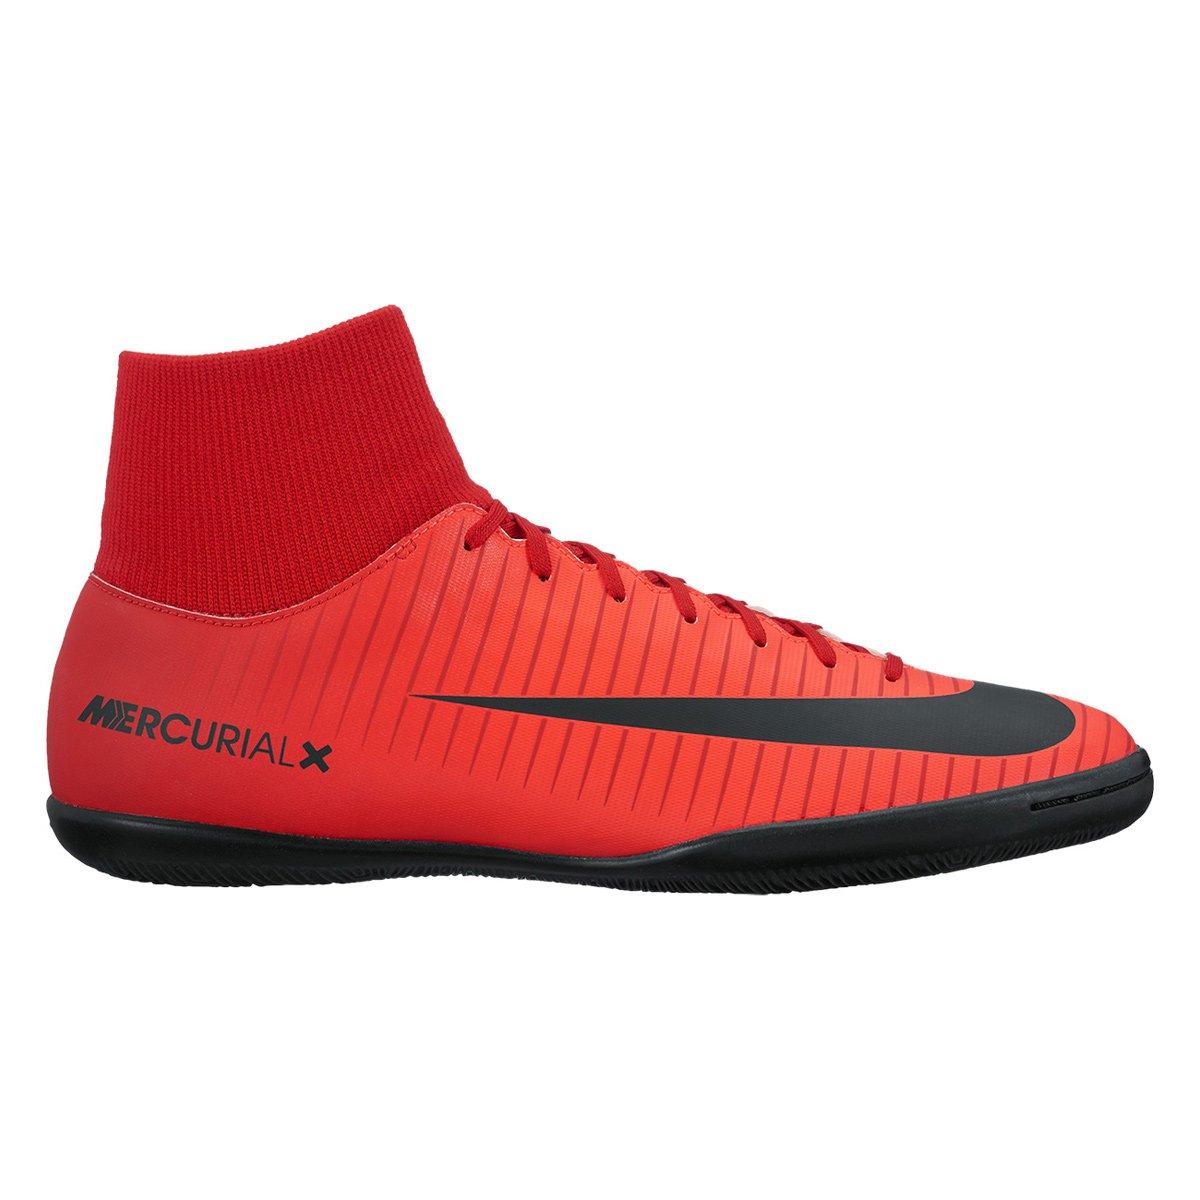 94ce0c1d83 Chuteira Futsal Nike Mercurial Victory 6 DF IC - Compre Agora